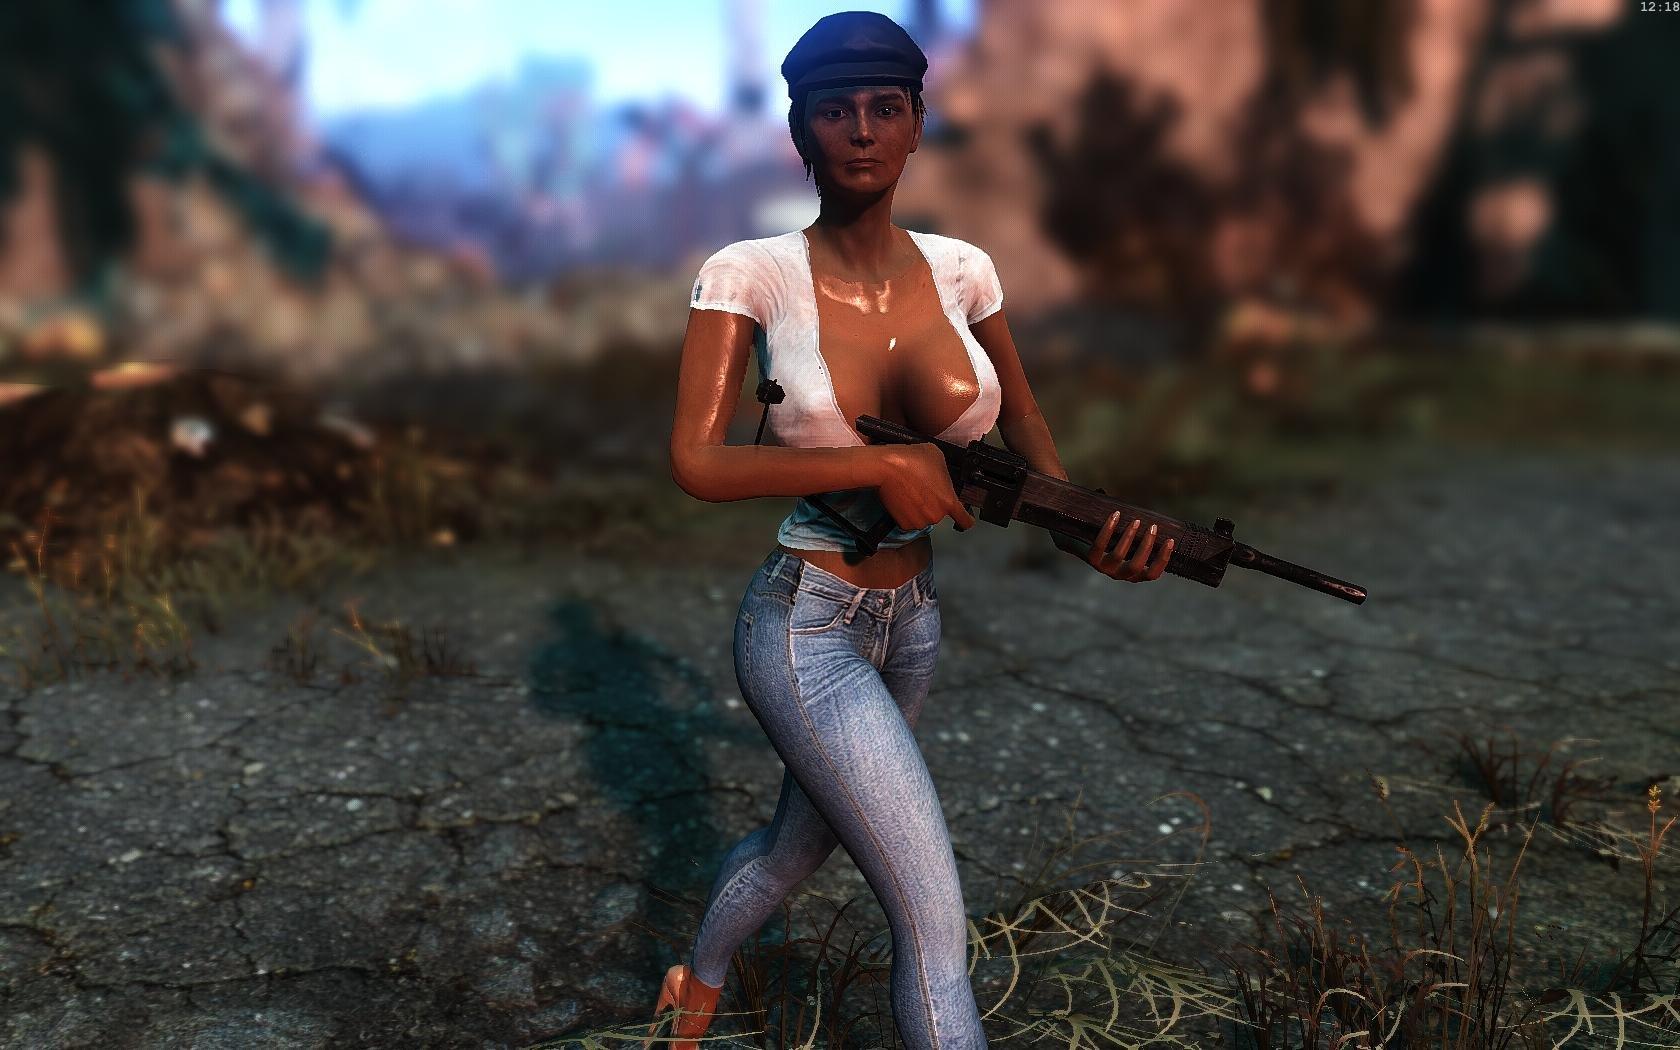 Fallout4 2019-01-29 12-18-57-65